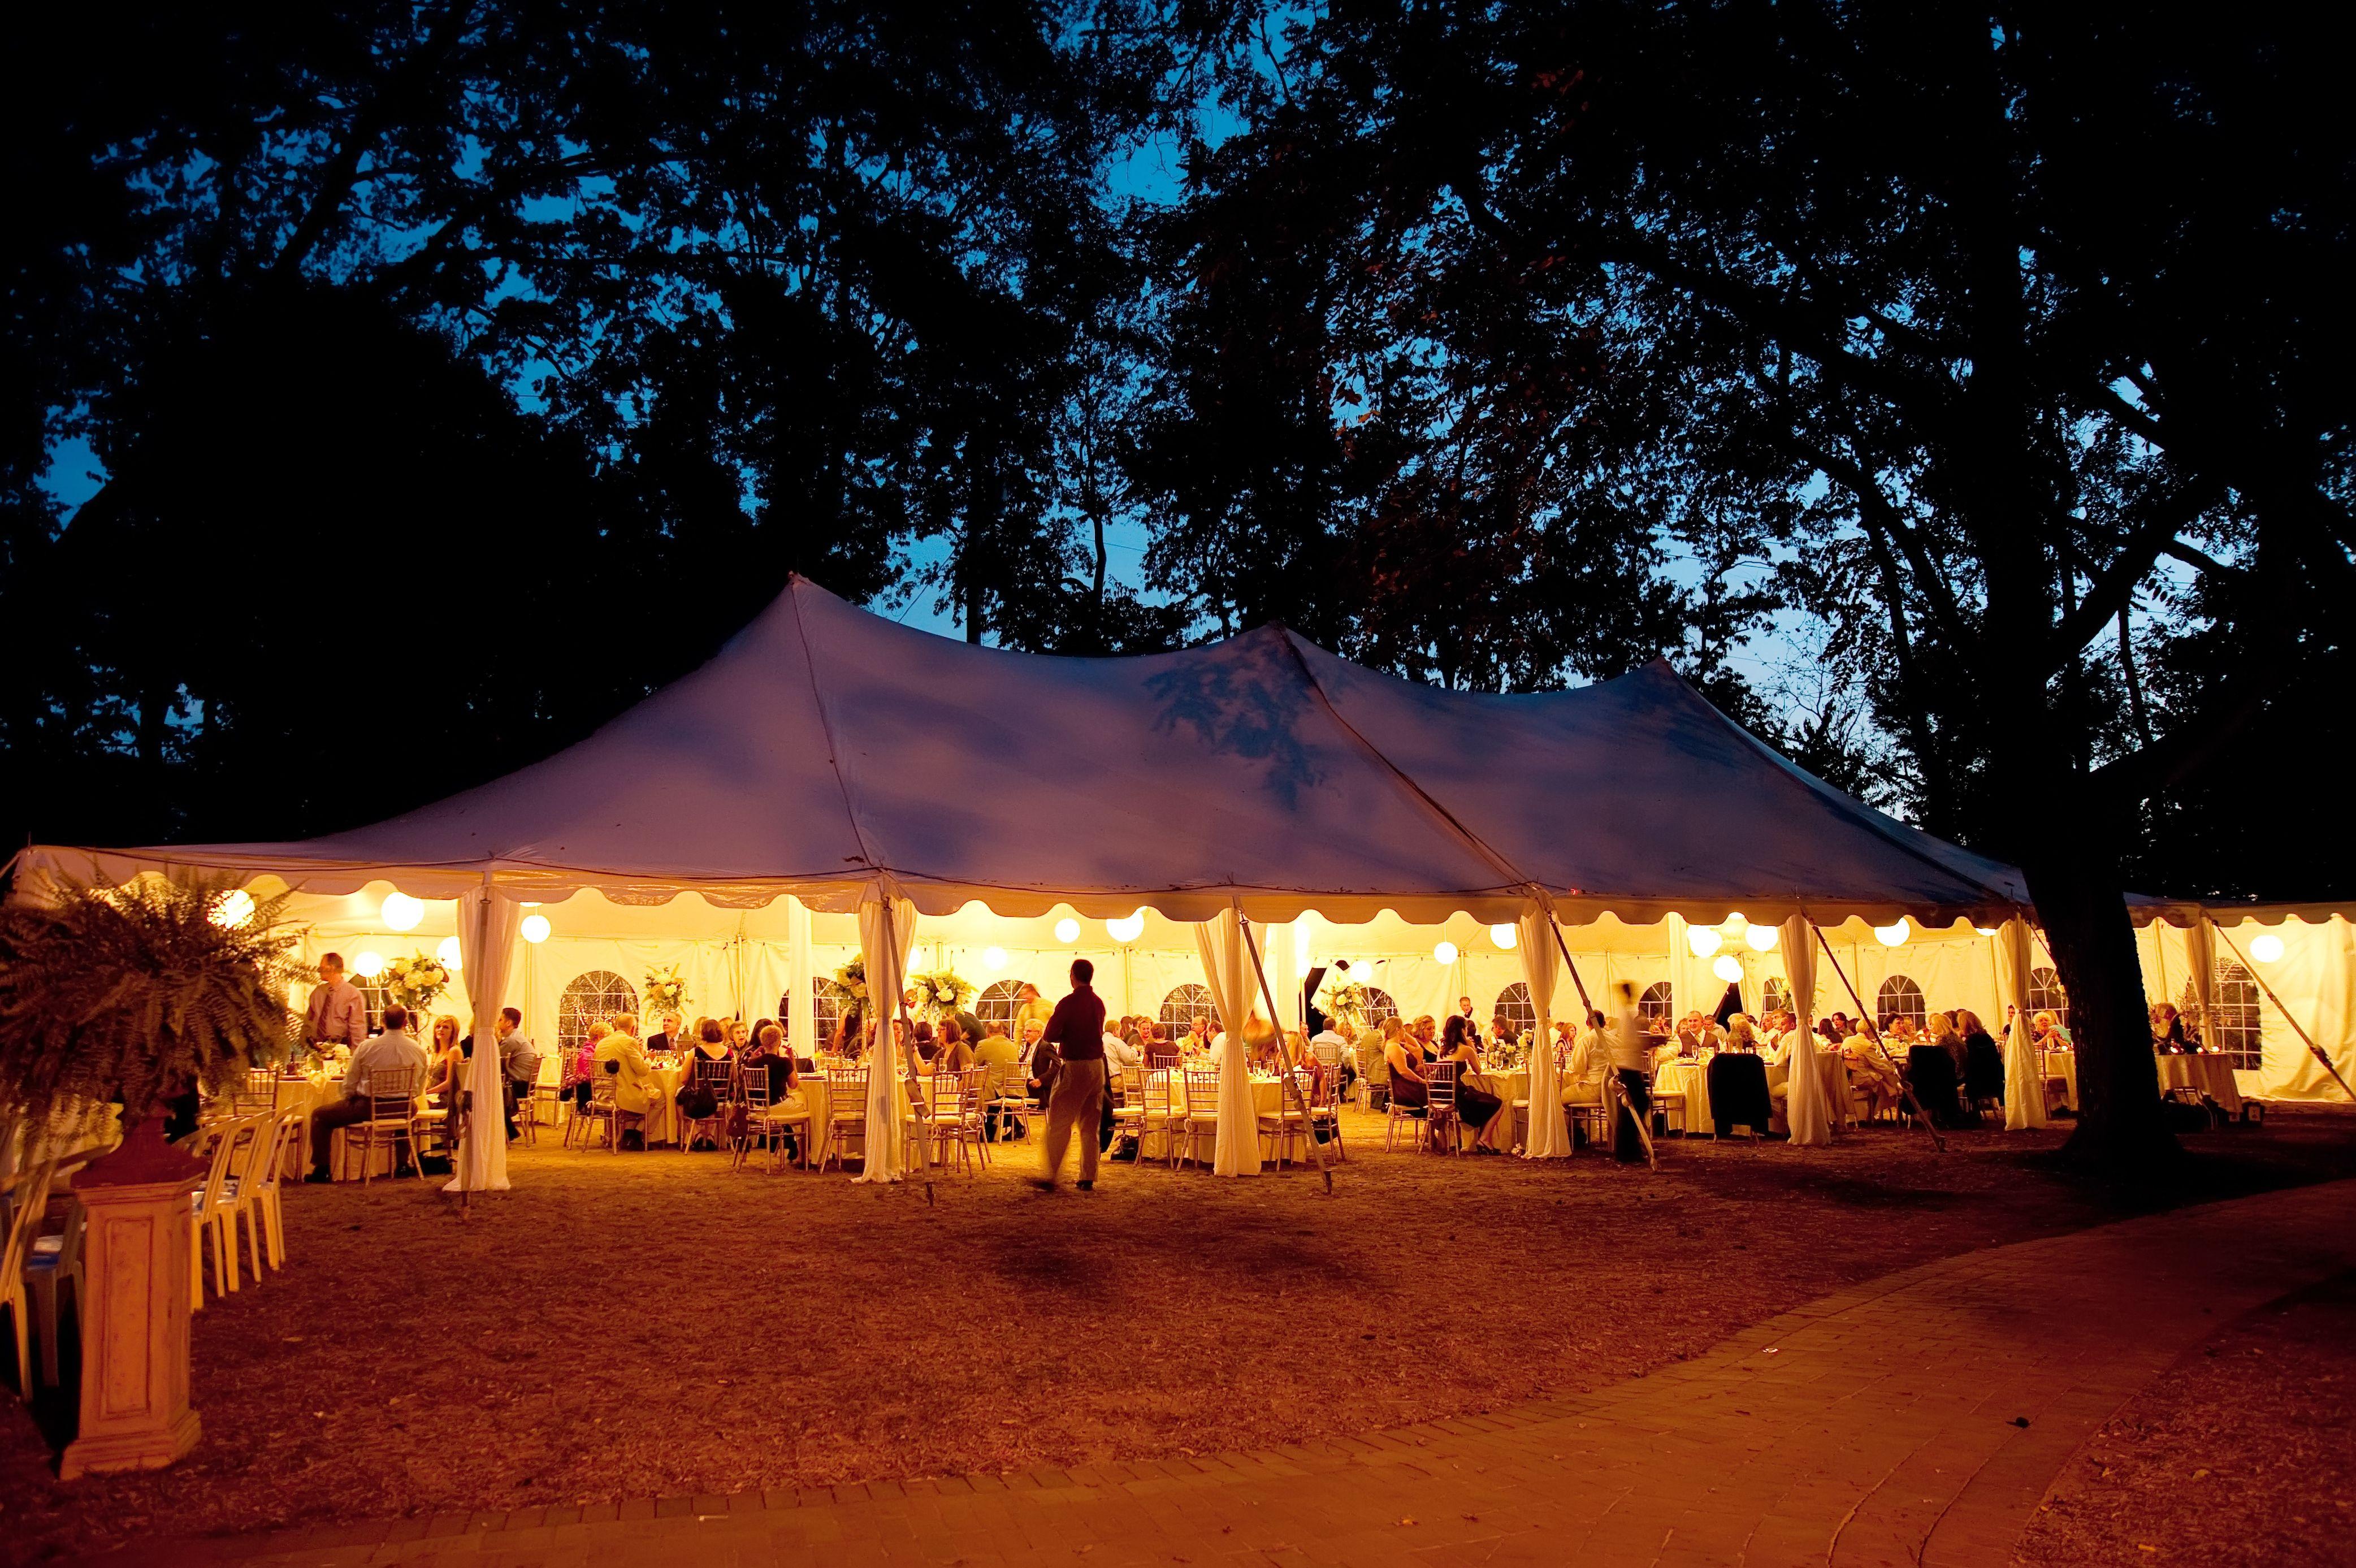 Benham S Grove Dayton Ohio Www Primetimepartyrental Com Dayton Weddings Events Primetimepr Markgarberphotogr Event Rental Tent Reception Tent Rentals